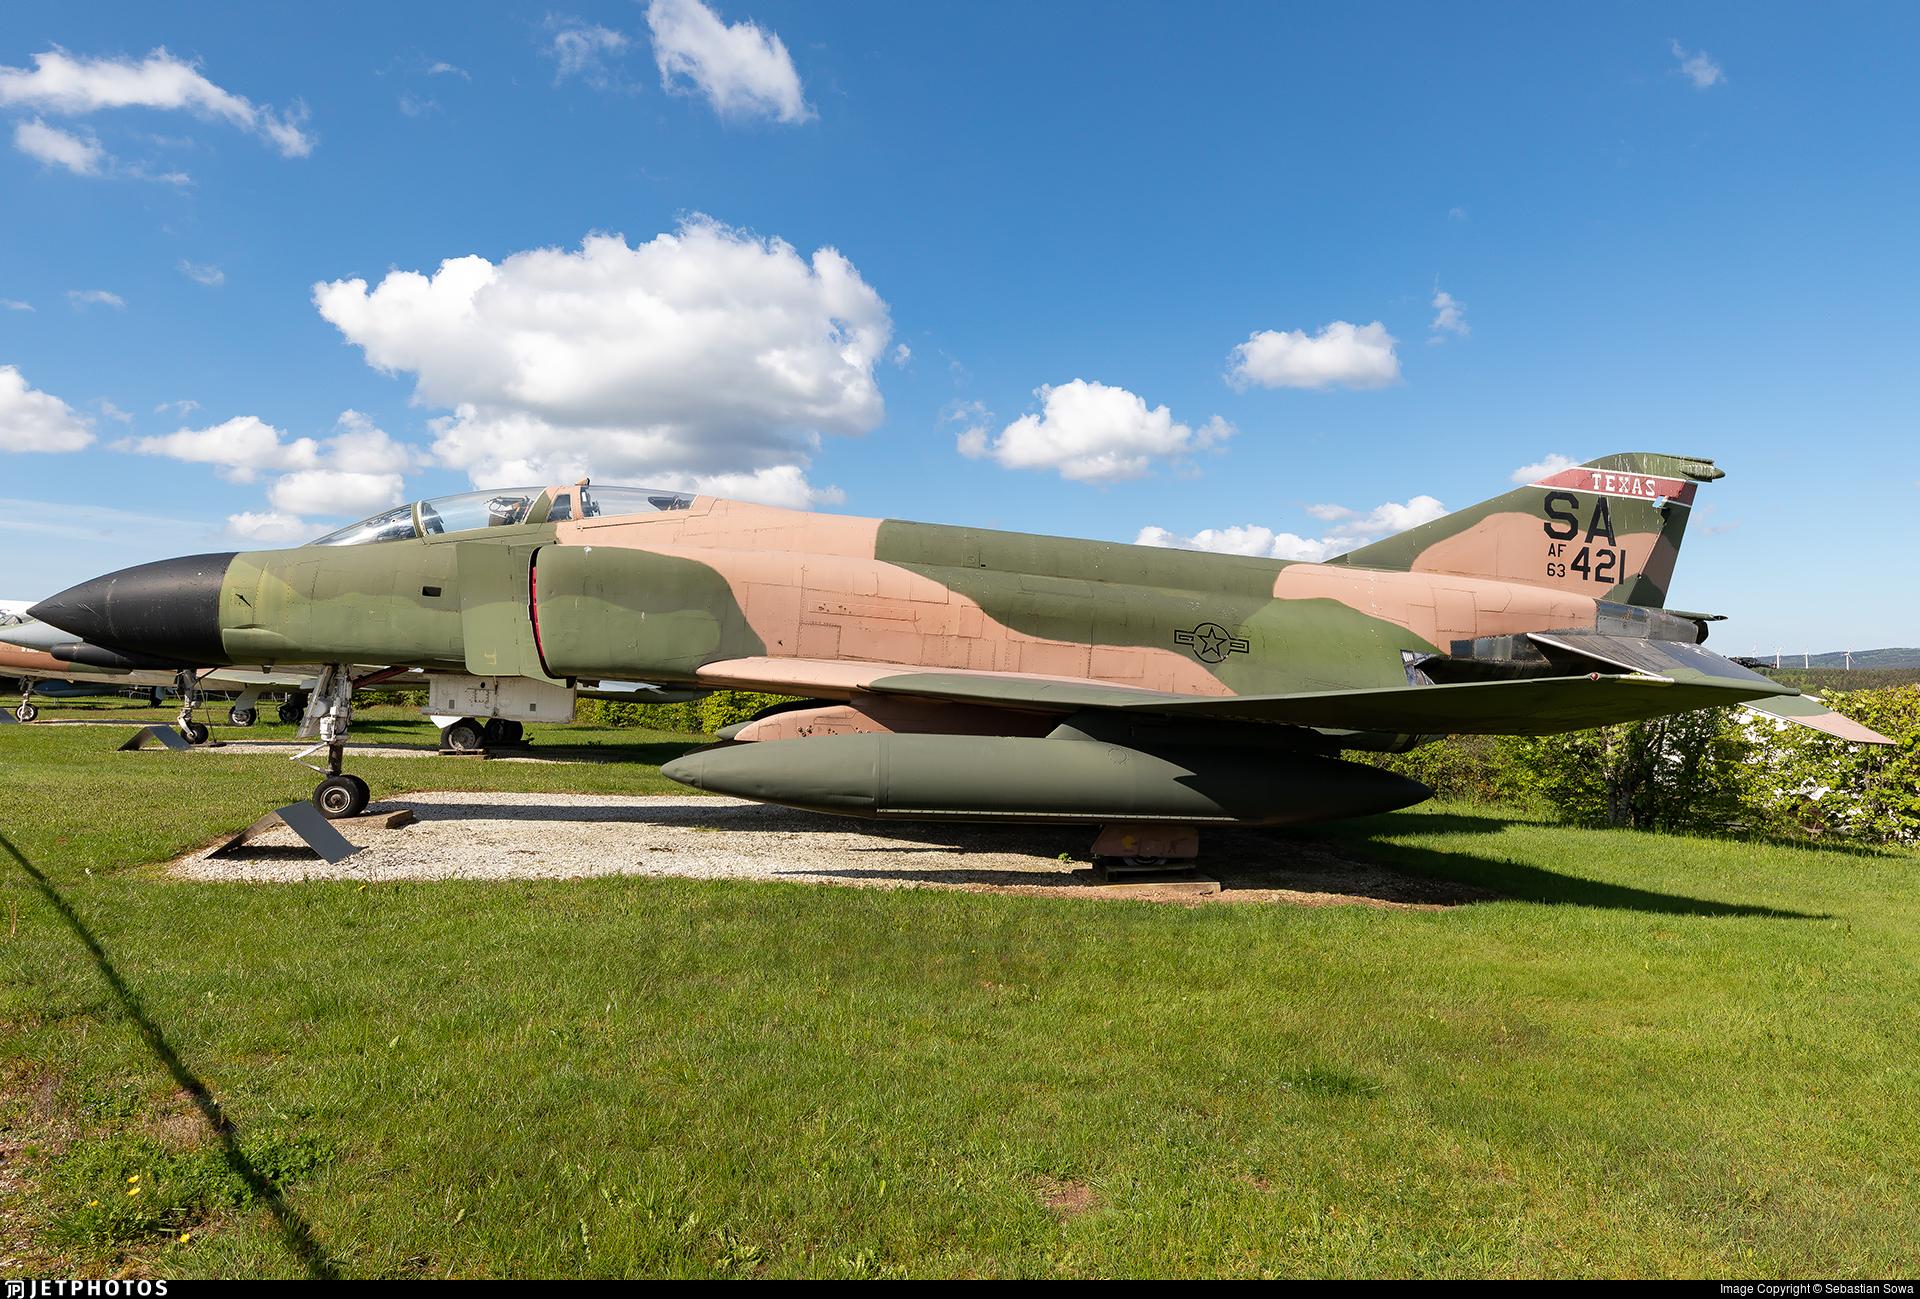 63-7421 - McDonnell Douglas F-4C Phantom II - United States - US Air Force (USAF)